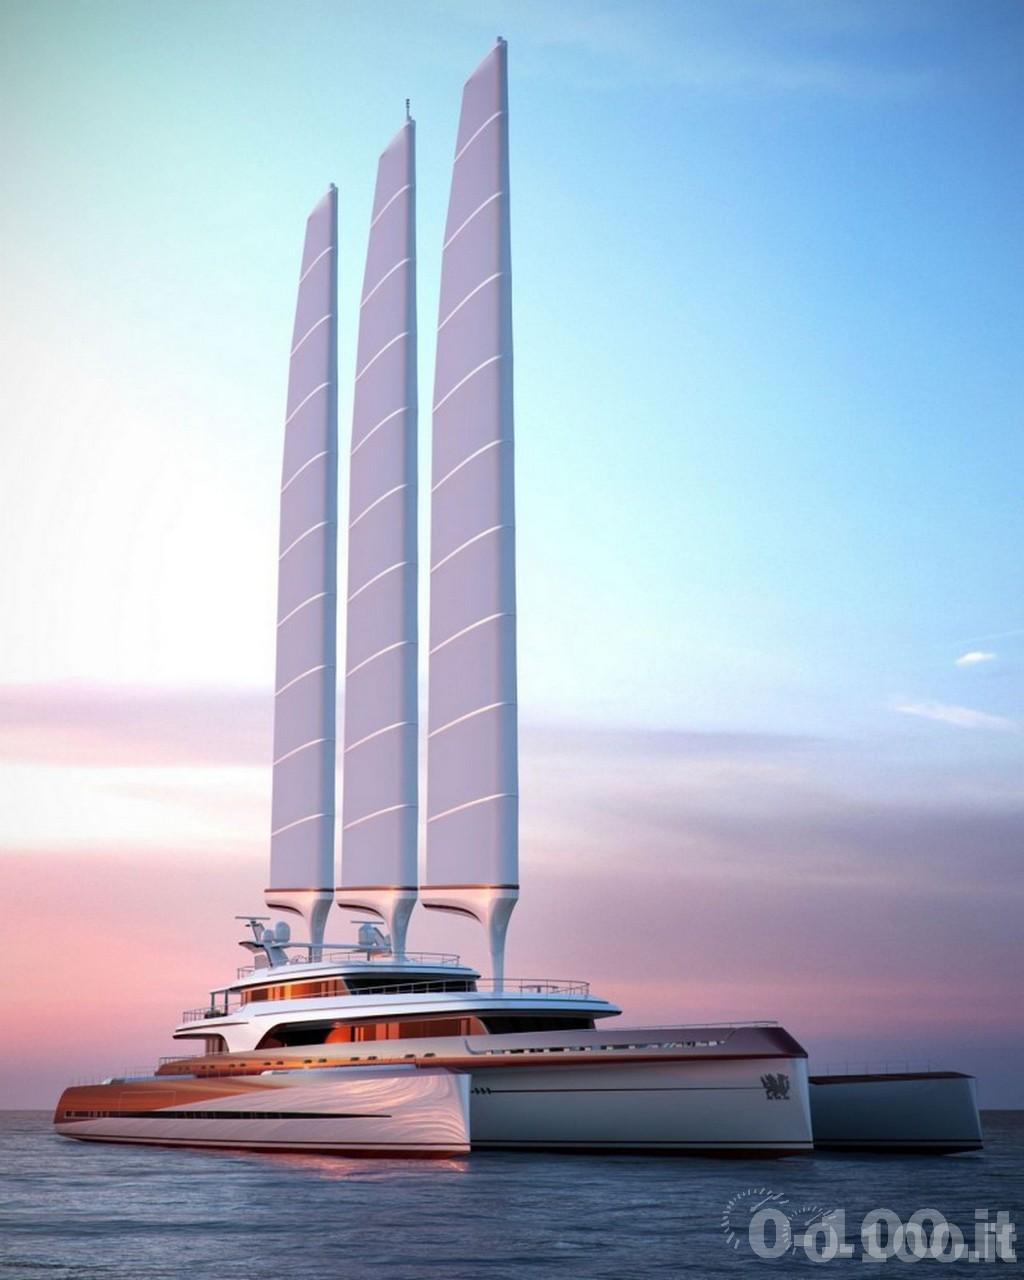 dragonship-80-trimaran-pi-yachts-mcpherson-yacht-design-0-100_5